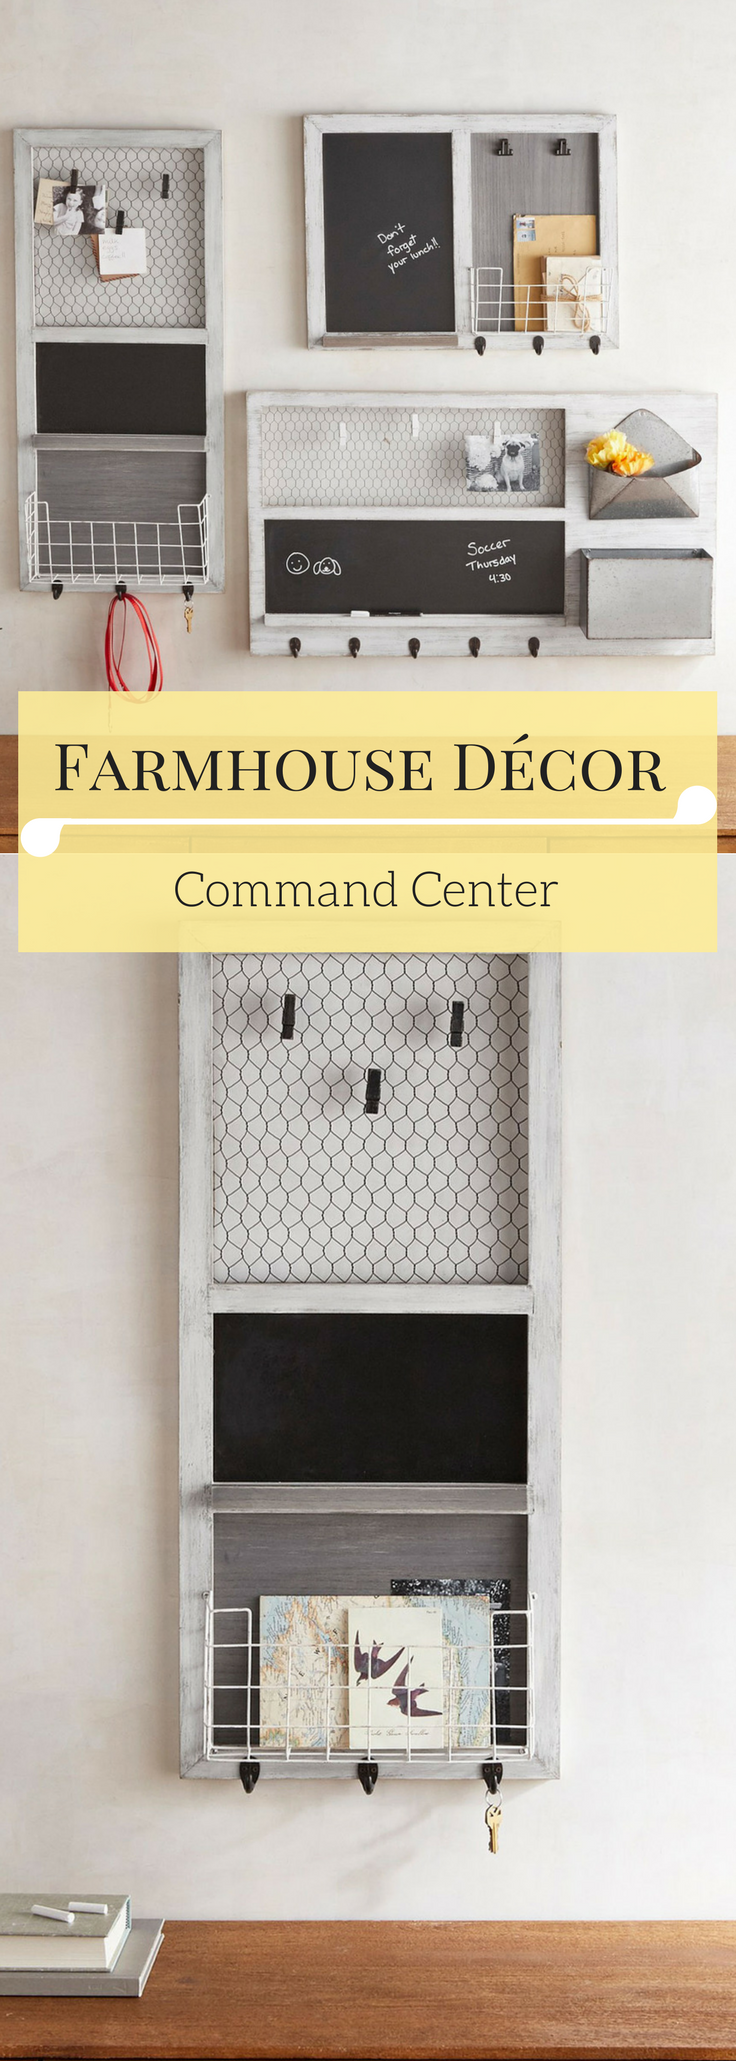 Farmhouse Décor - Command Center - Wall Art- Multifunctional Frames ...